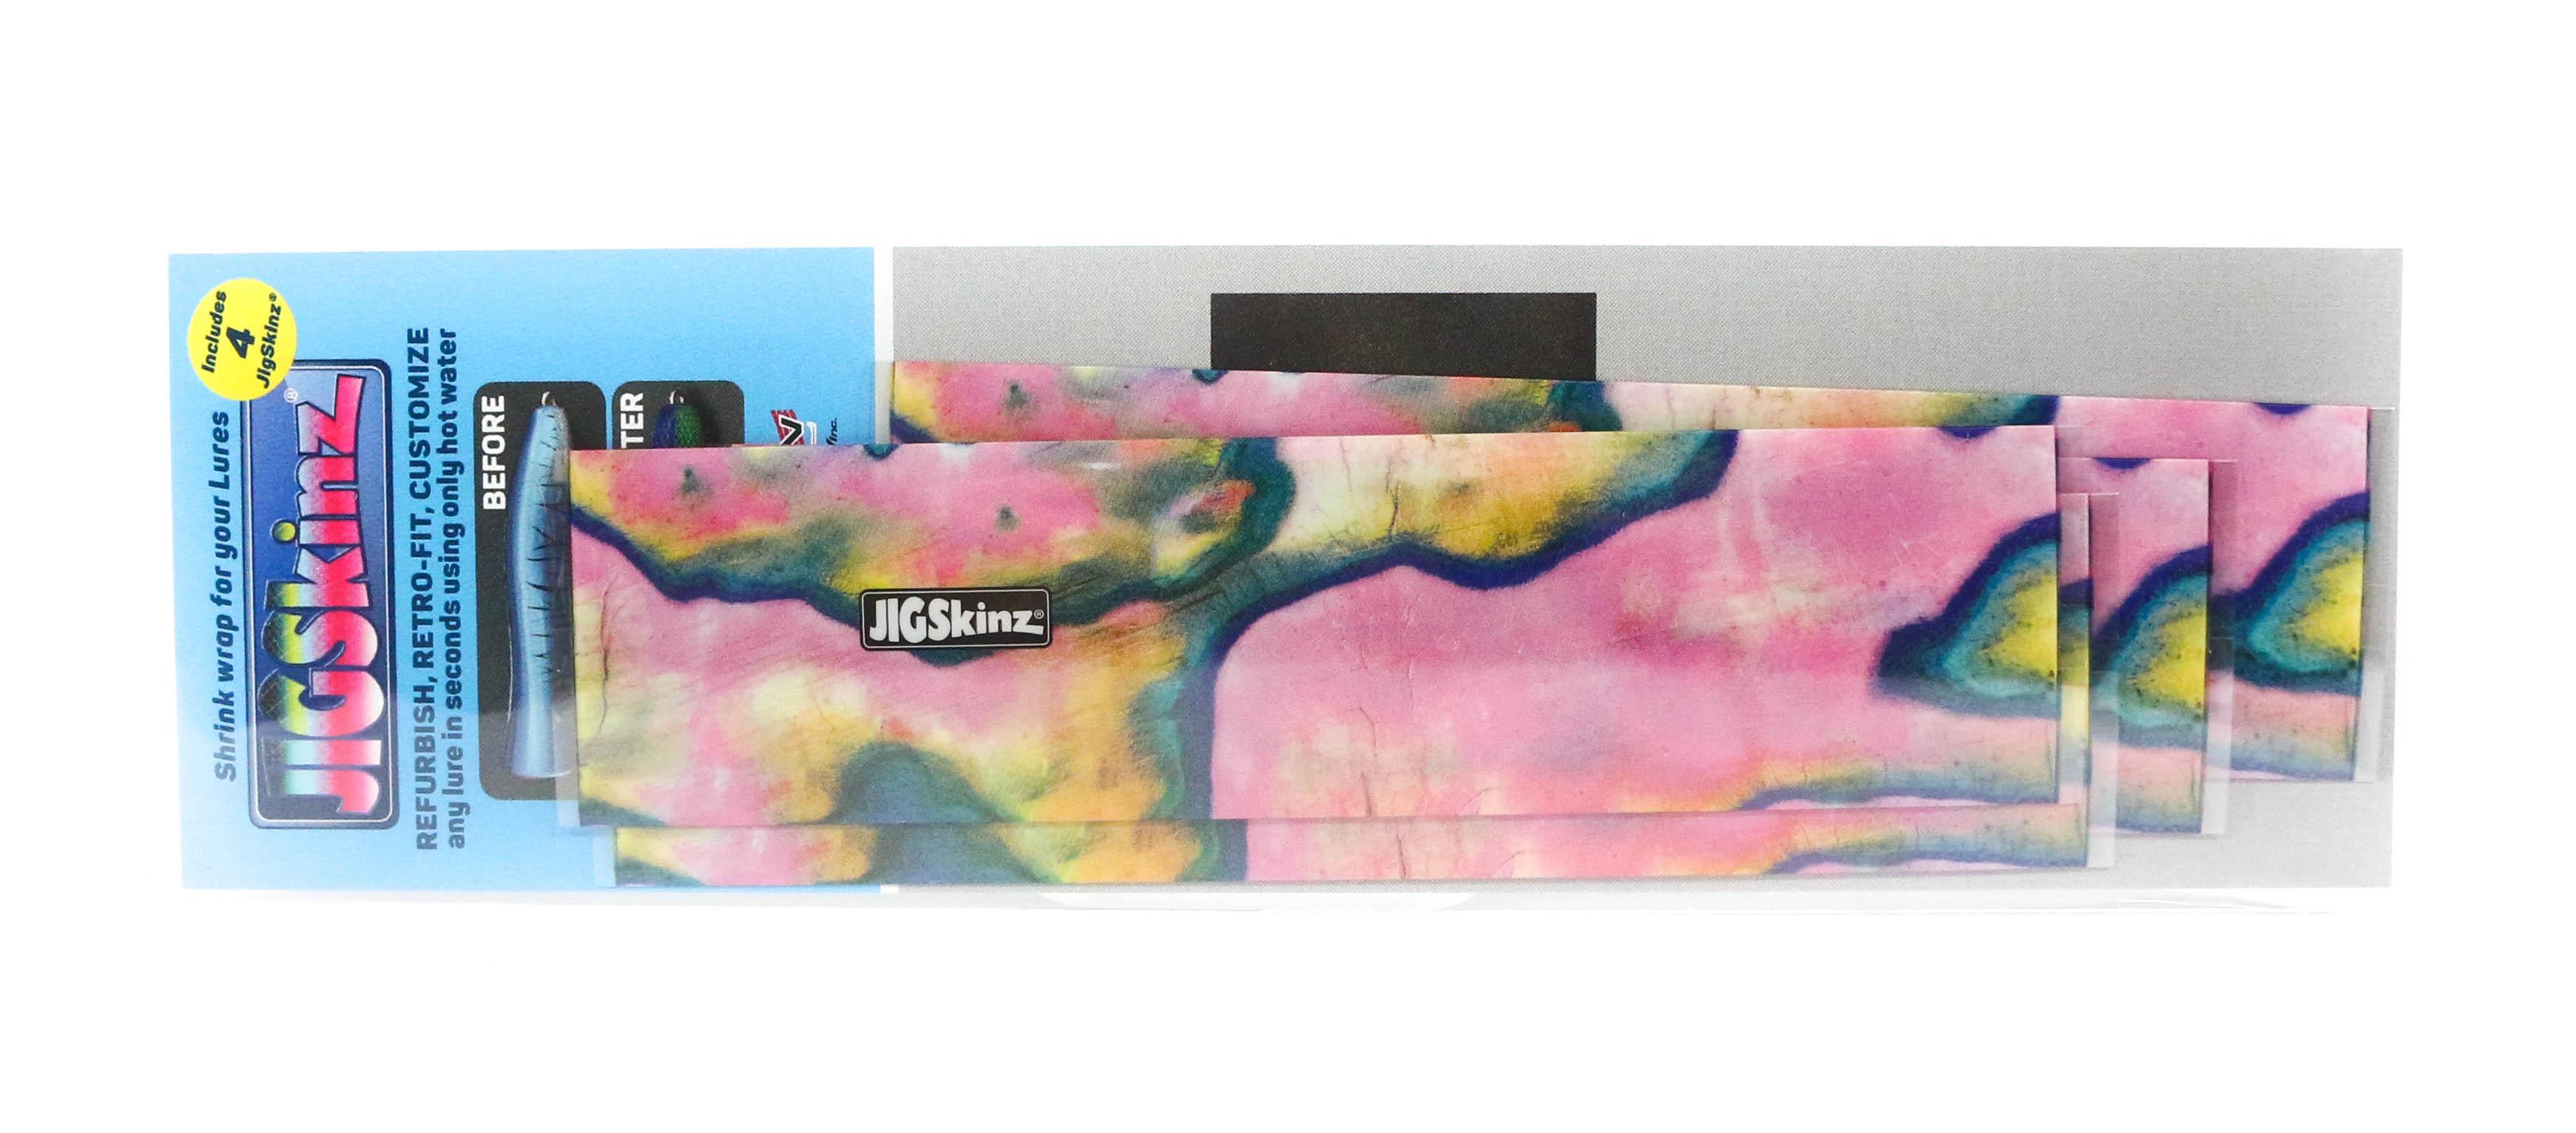 Jigskinz JZABPK-S4 Abalone Pink 140 x 70mm x 4 pieces Small (3268)